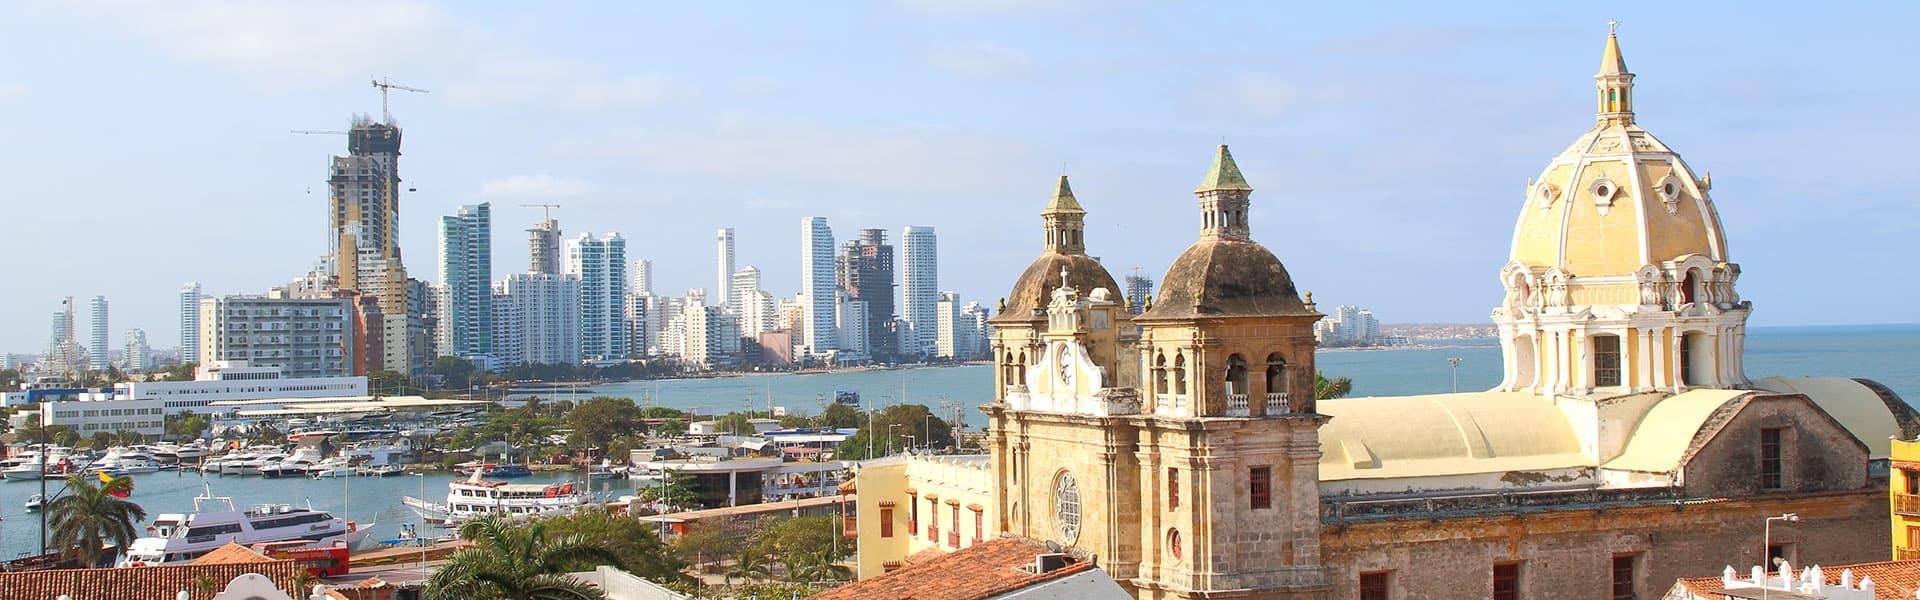 Canal de Panamá: México y Costa Rica